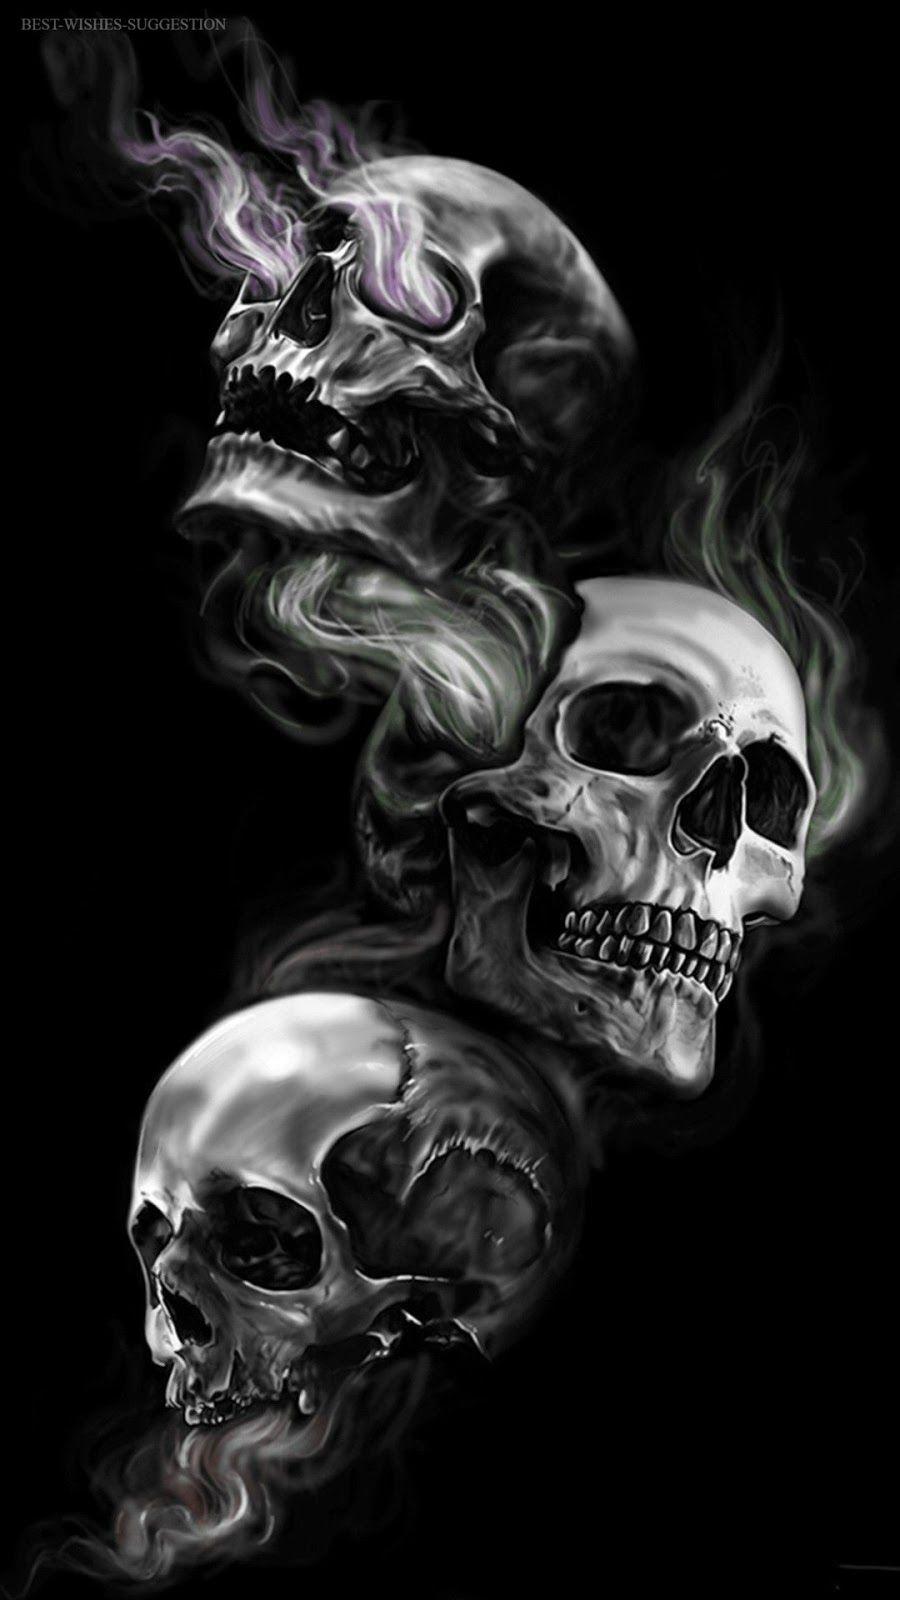 Iphone Wallpaper Iphone Mobile Wallpaper Skull Wallpaper Iphone Black Skulls Wallpaper Skulls Drawing Tattoo wallpaper for mobile